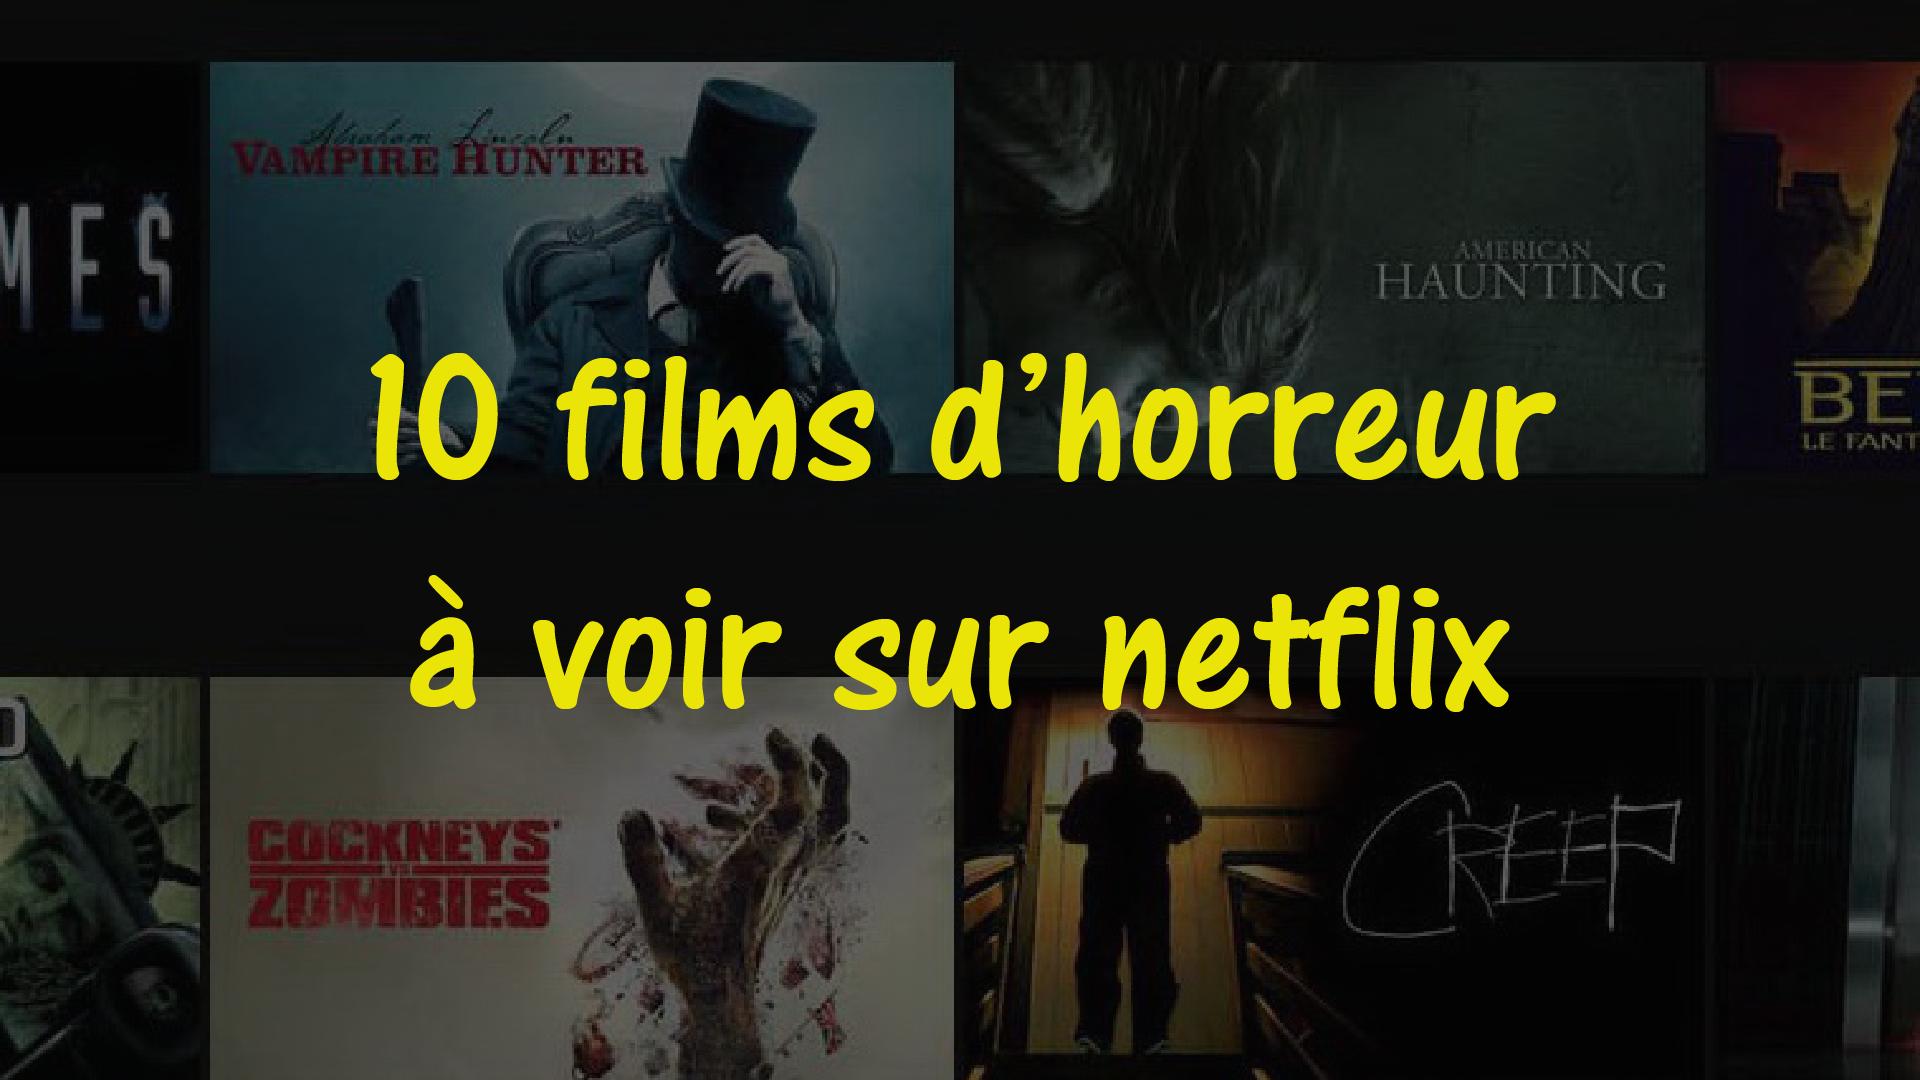 film d 39 horreur netflix 10 bons films sur le netflix france. Black Bedroom Furniture Sets. Home Design Ideas